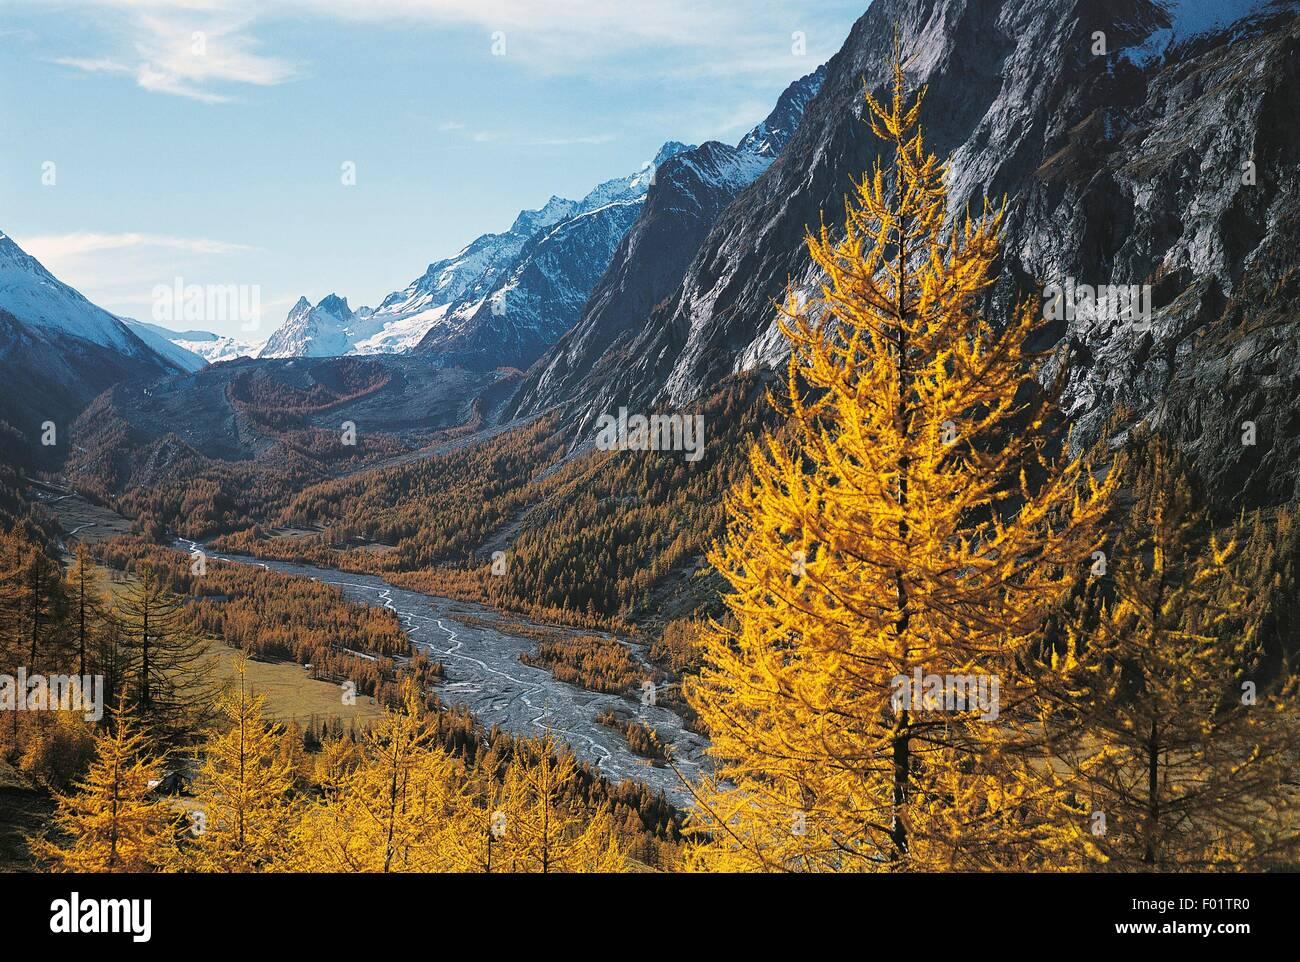 Dora di Veny River, in the background the Miage Glacier, Mont Blanc, Val Veny, Aosta Valley, Italy. - Stock Image